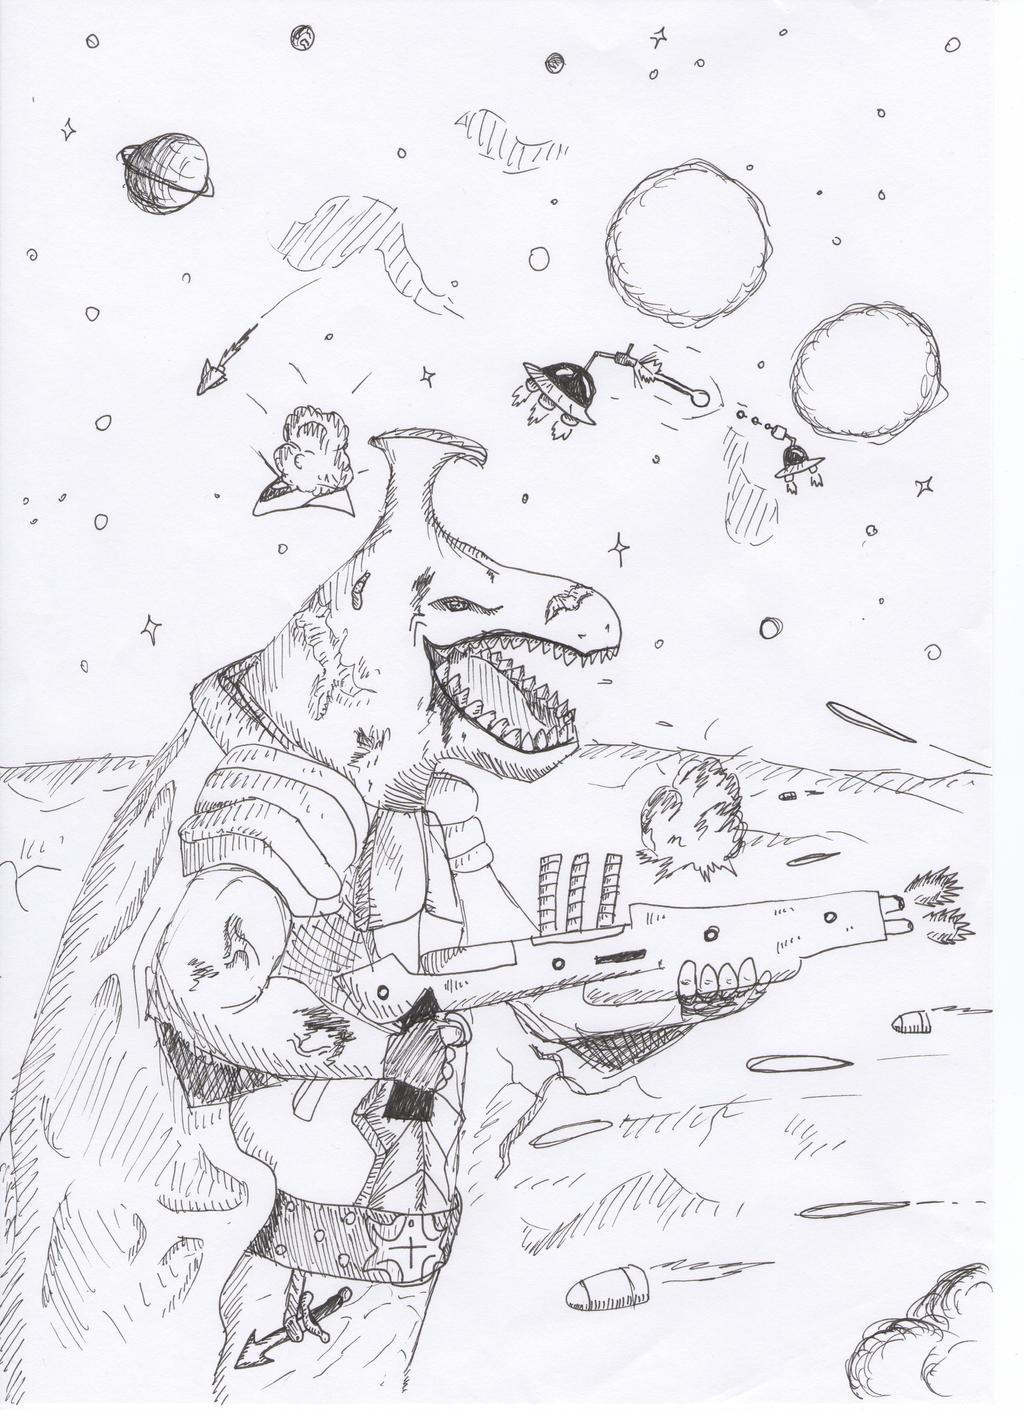 Dinosaur,space yeah by Spyhamschter